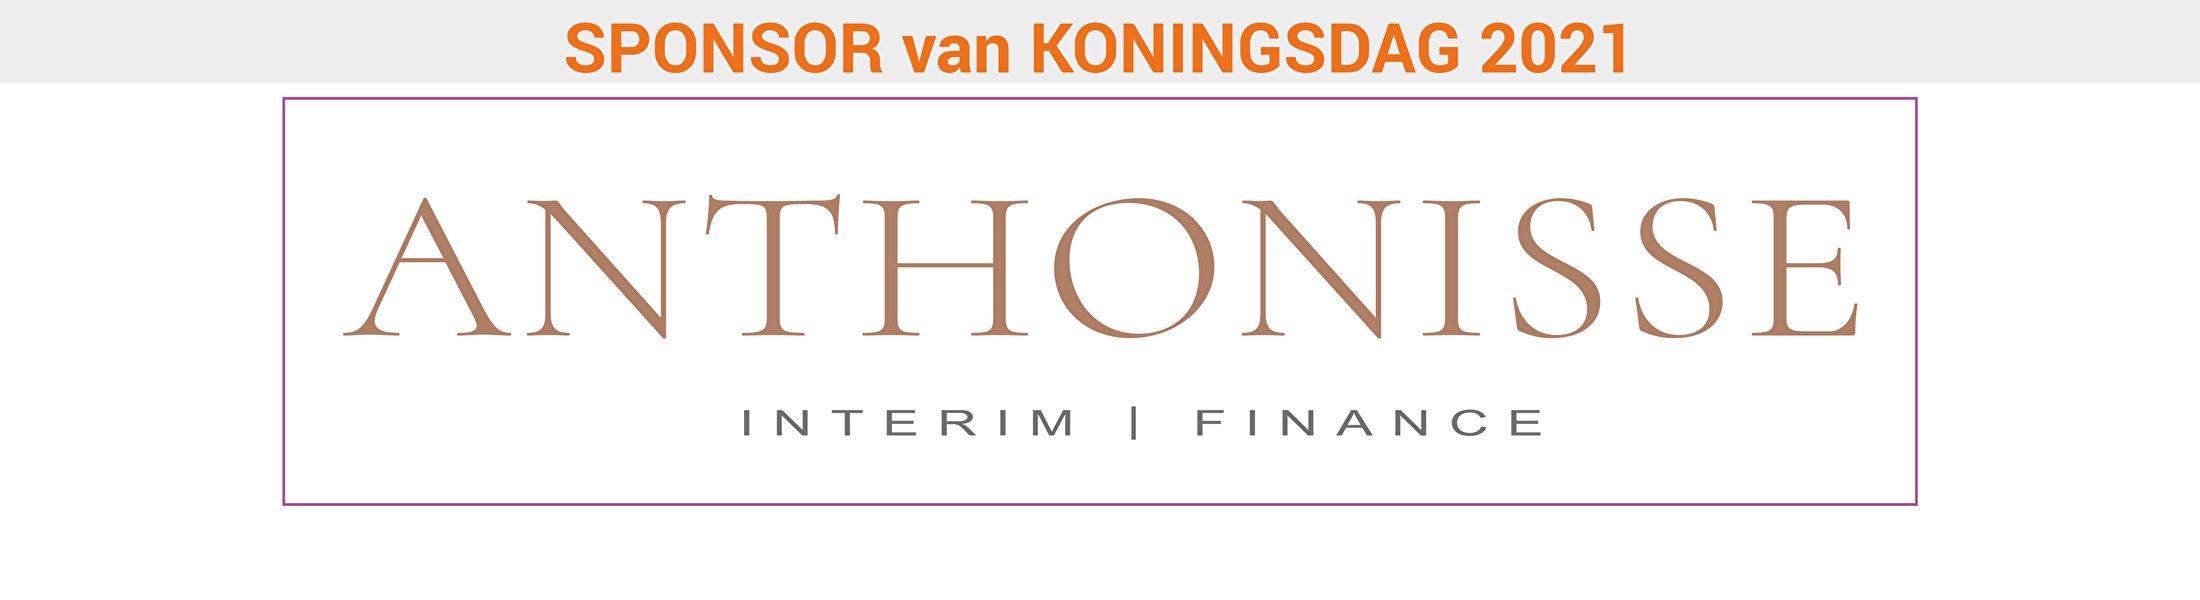 Anthonisse Finance